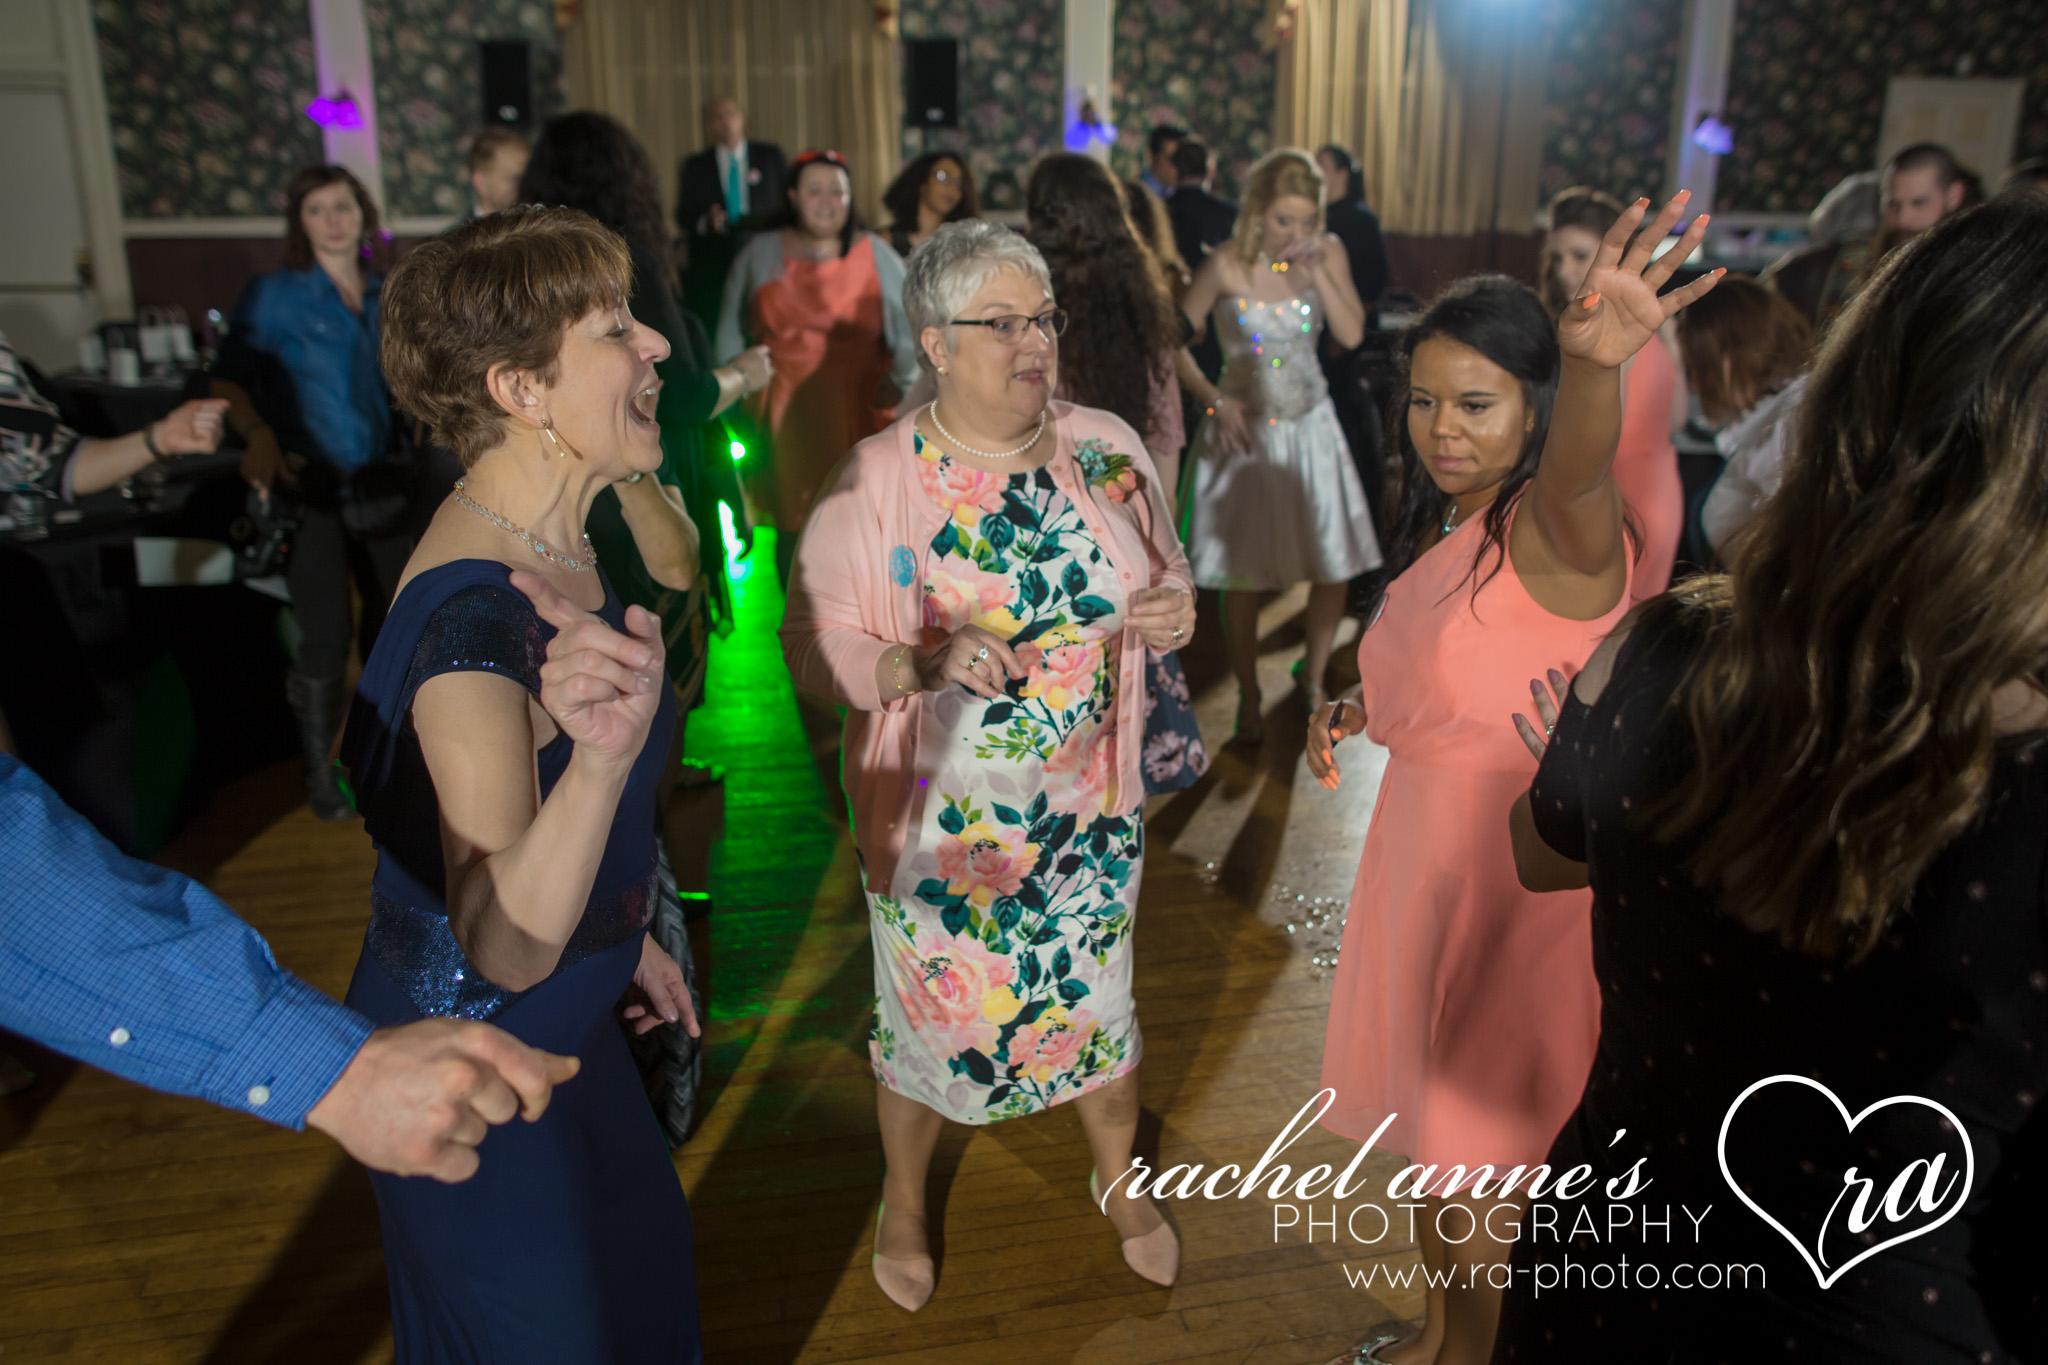 075-JKS-WEDDINGS-THE-FRANKLIN-PA.jpg